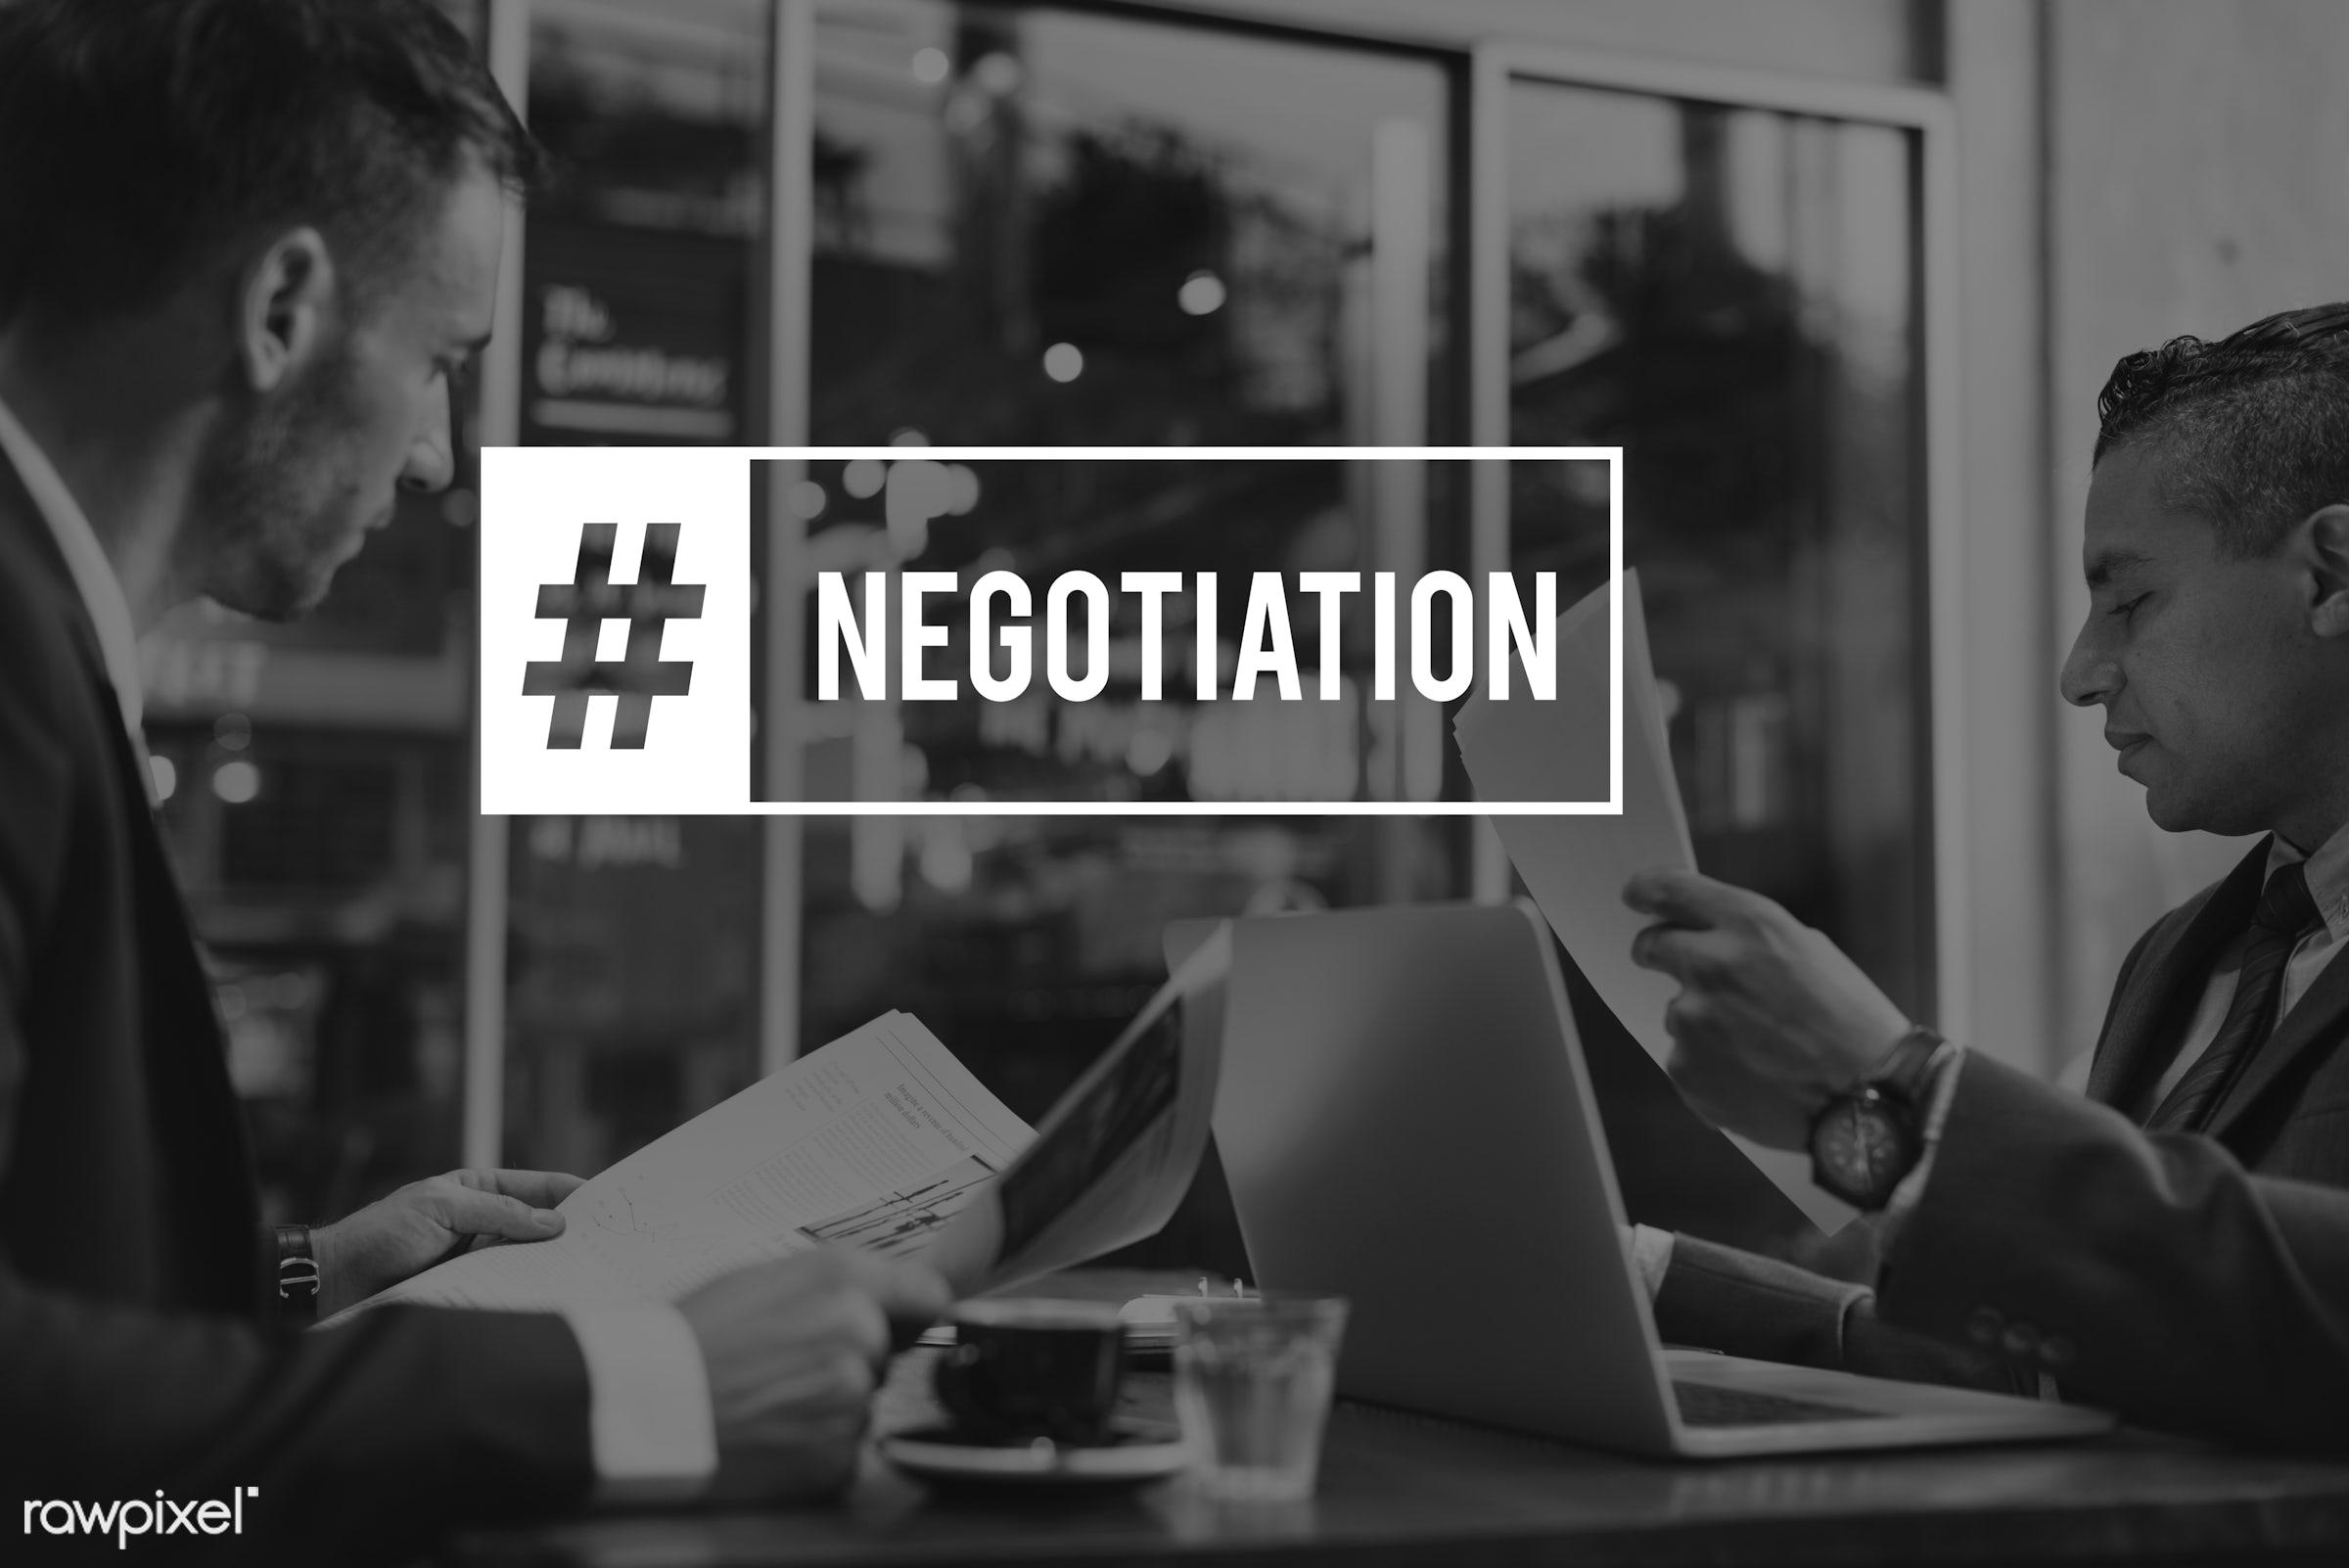 agreement, bargain, break, business, businessman, businessmen, caucasian, coffee, coffee break, collaboration, connection,...